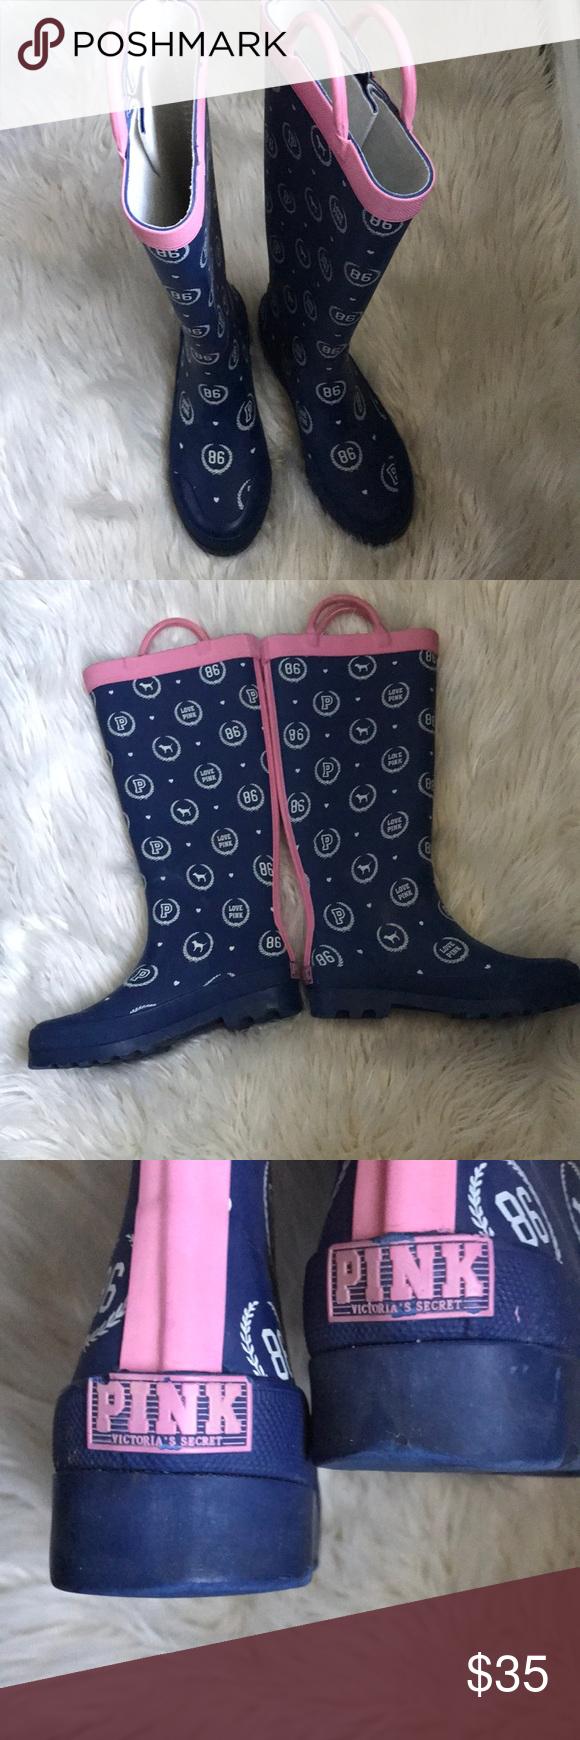 Victoria secret shoes, Boots, Rain boots